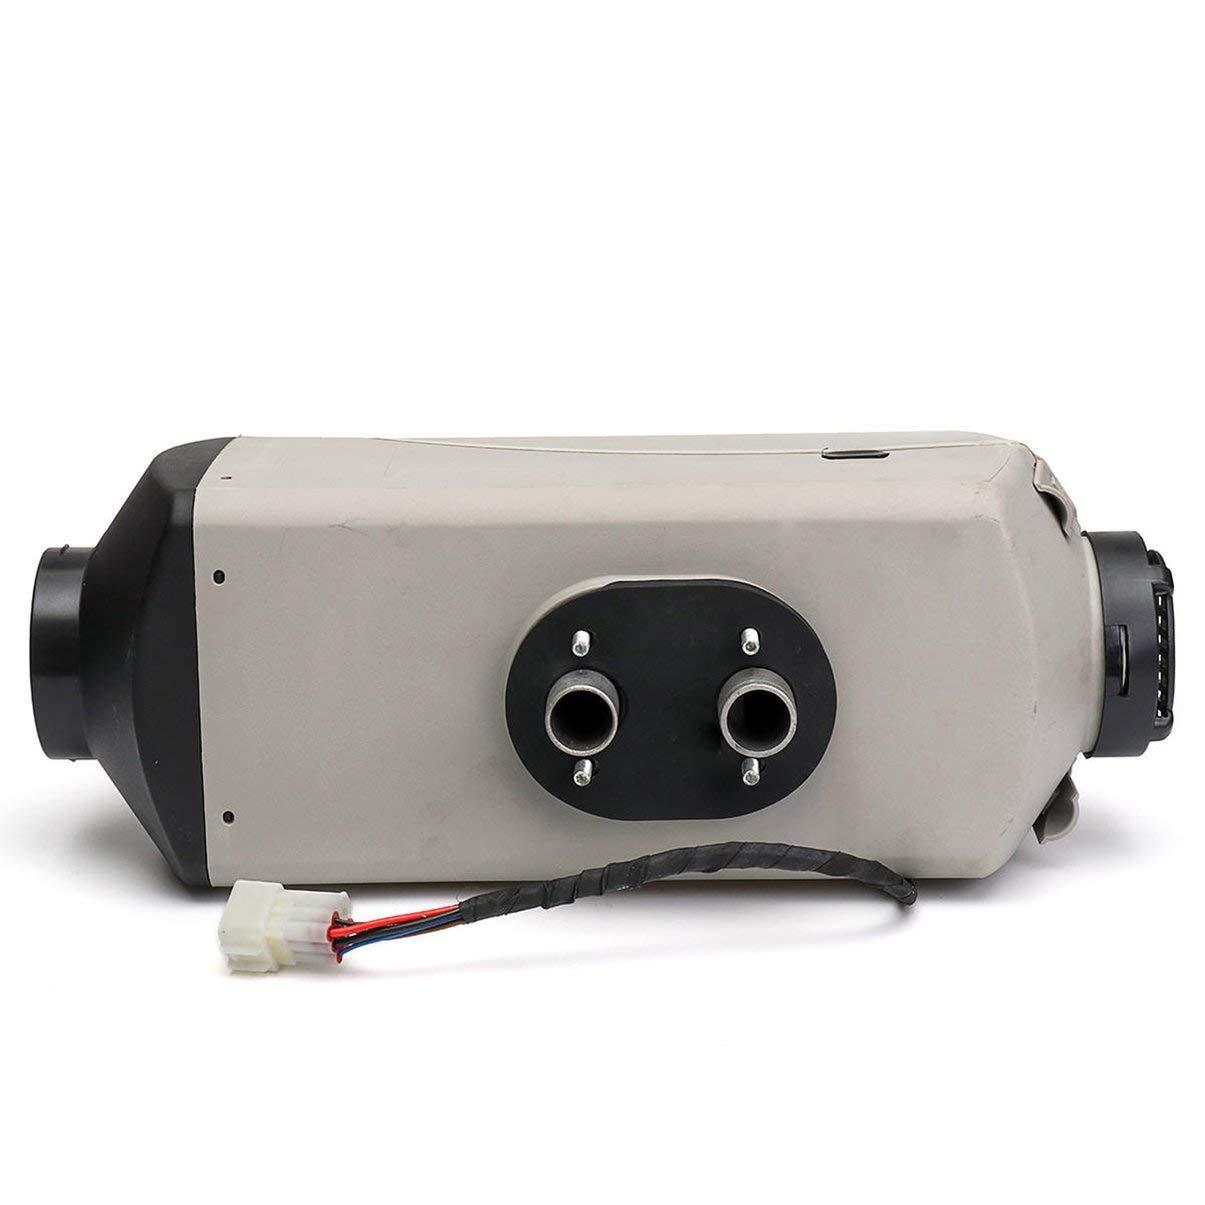 Riscaldatore Diesel kit con LCD per Auto Camion Yachts Barche Camper grigio 12v//8kw Diesel Riscaldatore Diesel Air Heater 12V Diesel Aria Riscaldatore